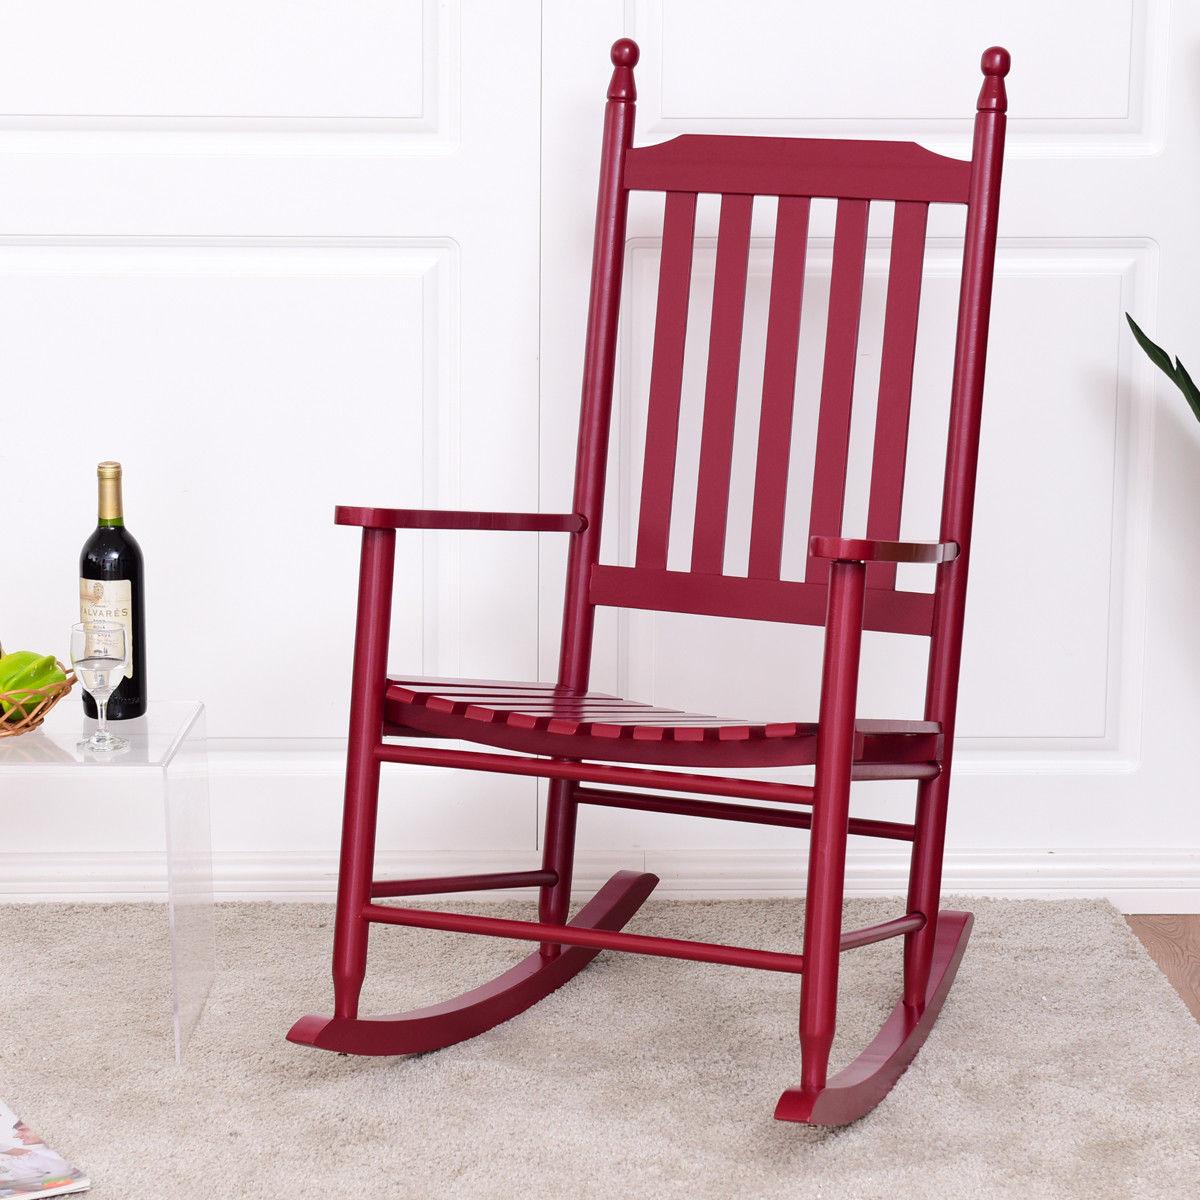 Giantex Wooden Rocking Chair Porch Rocker Modern Garden Patio Armchair Balcony Deck Garden Furniture HW56354RE